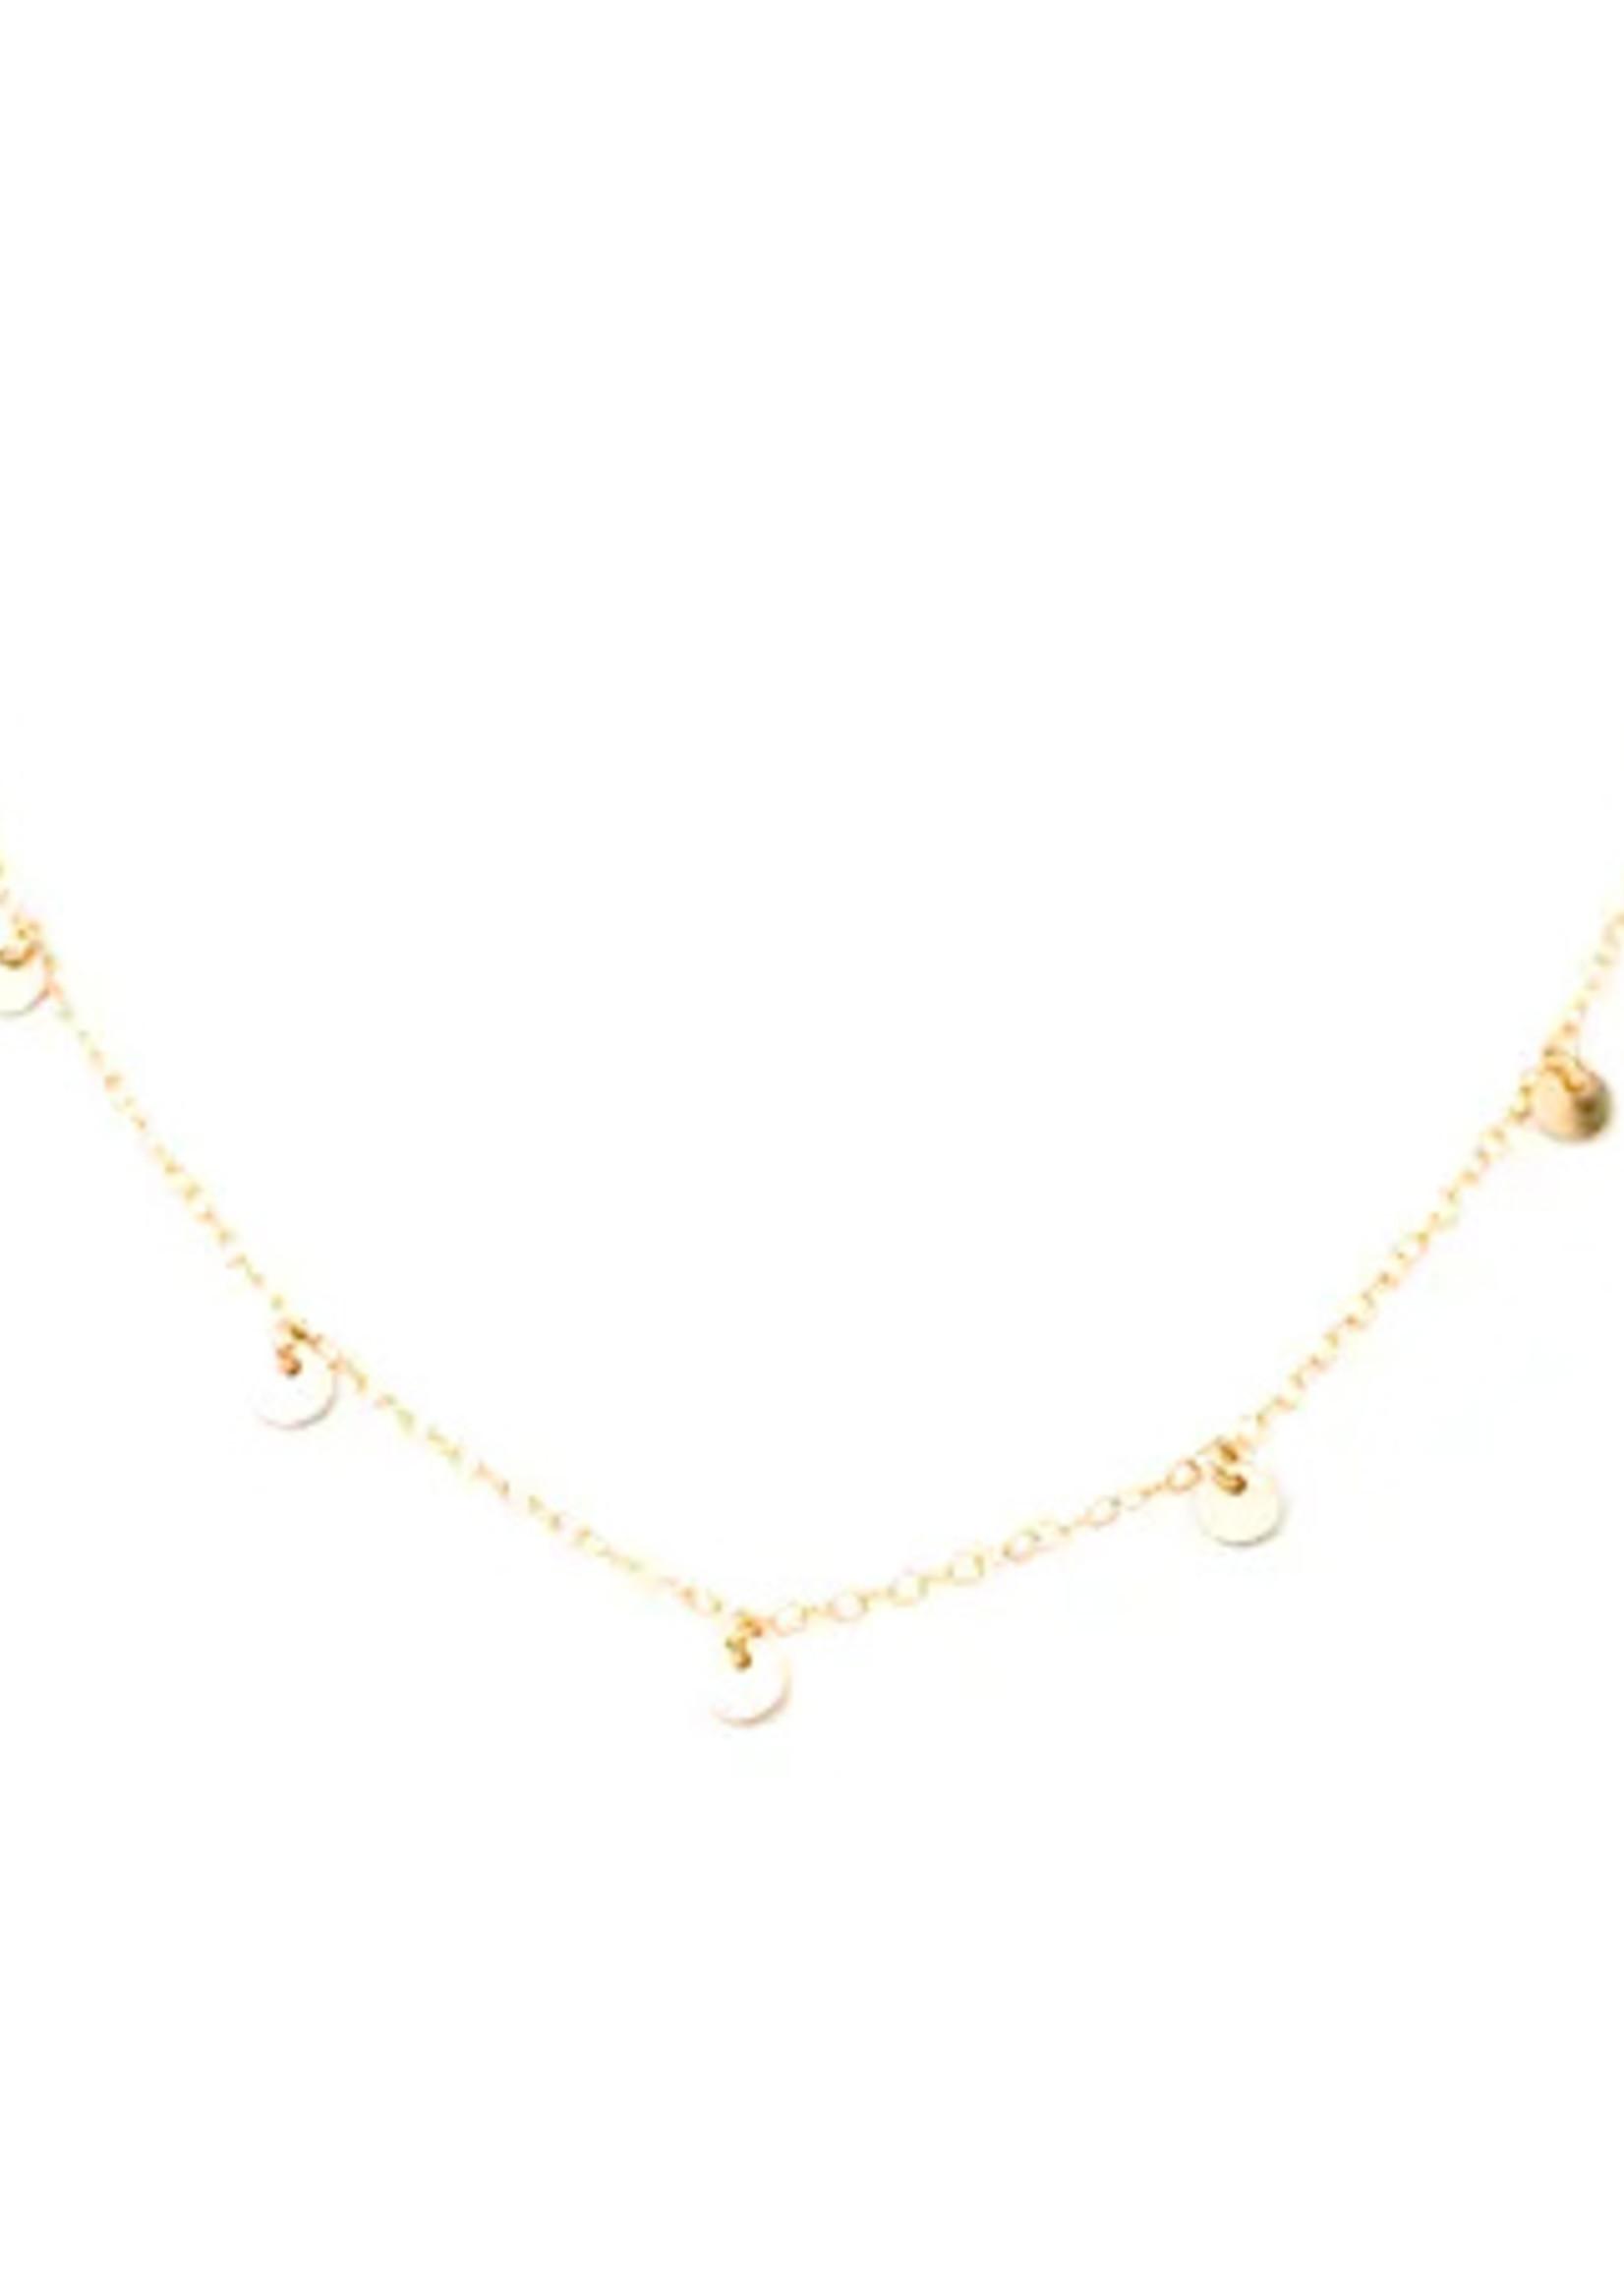 May Martin May Martin - Five Coin Necklace